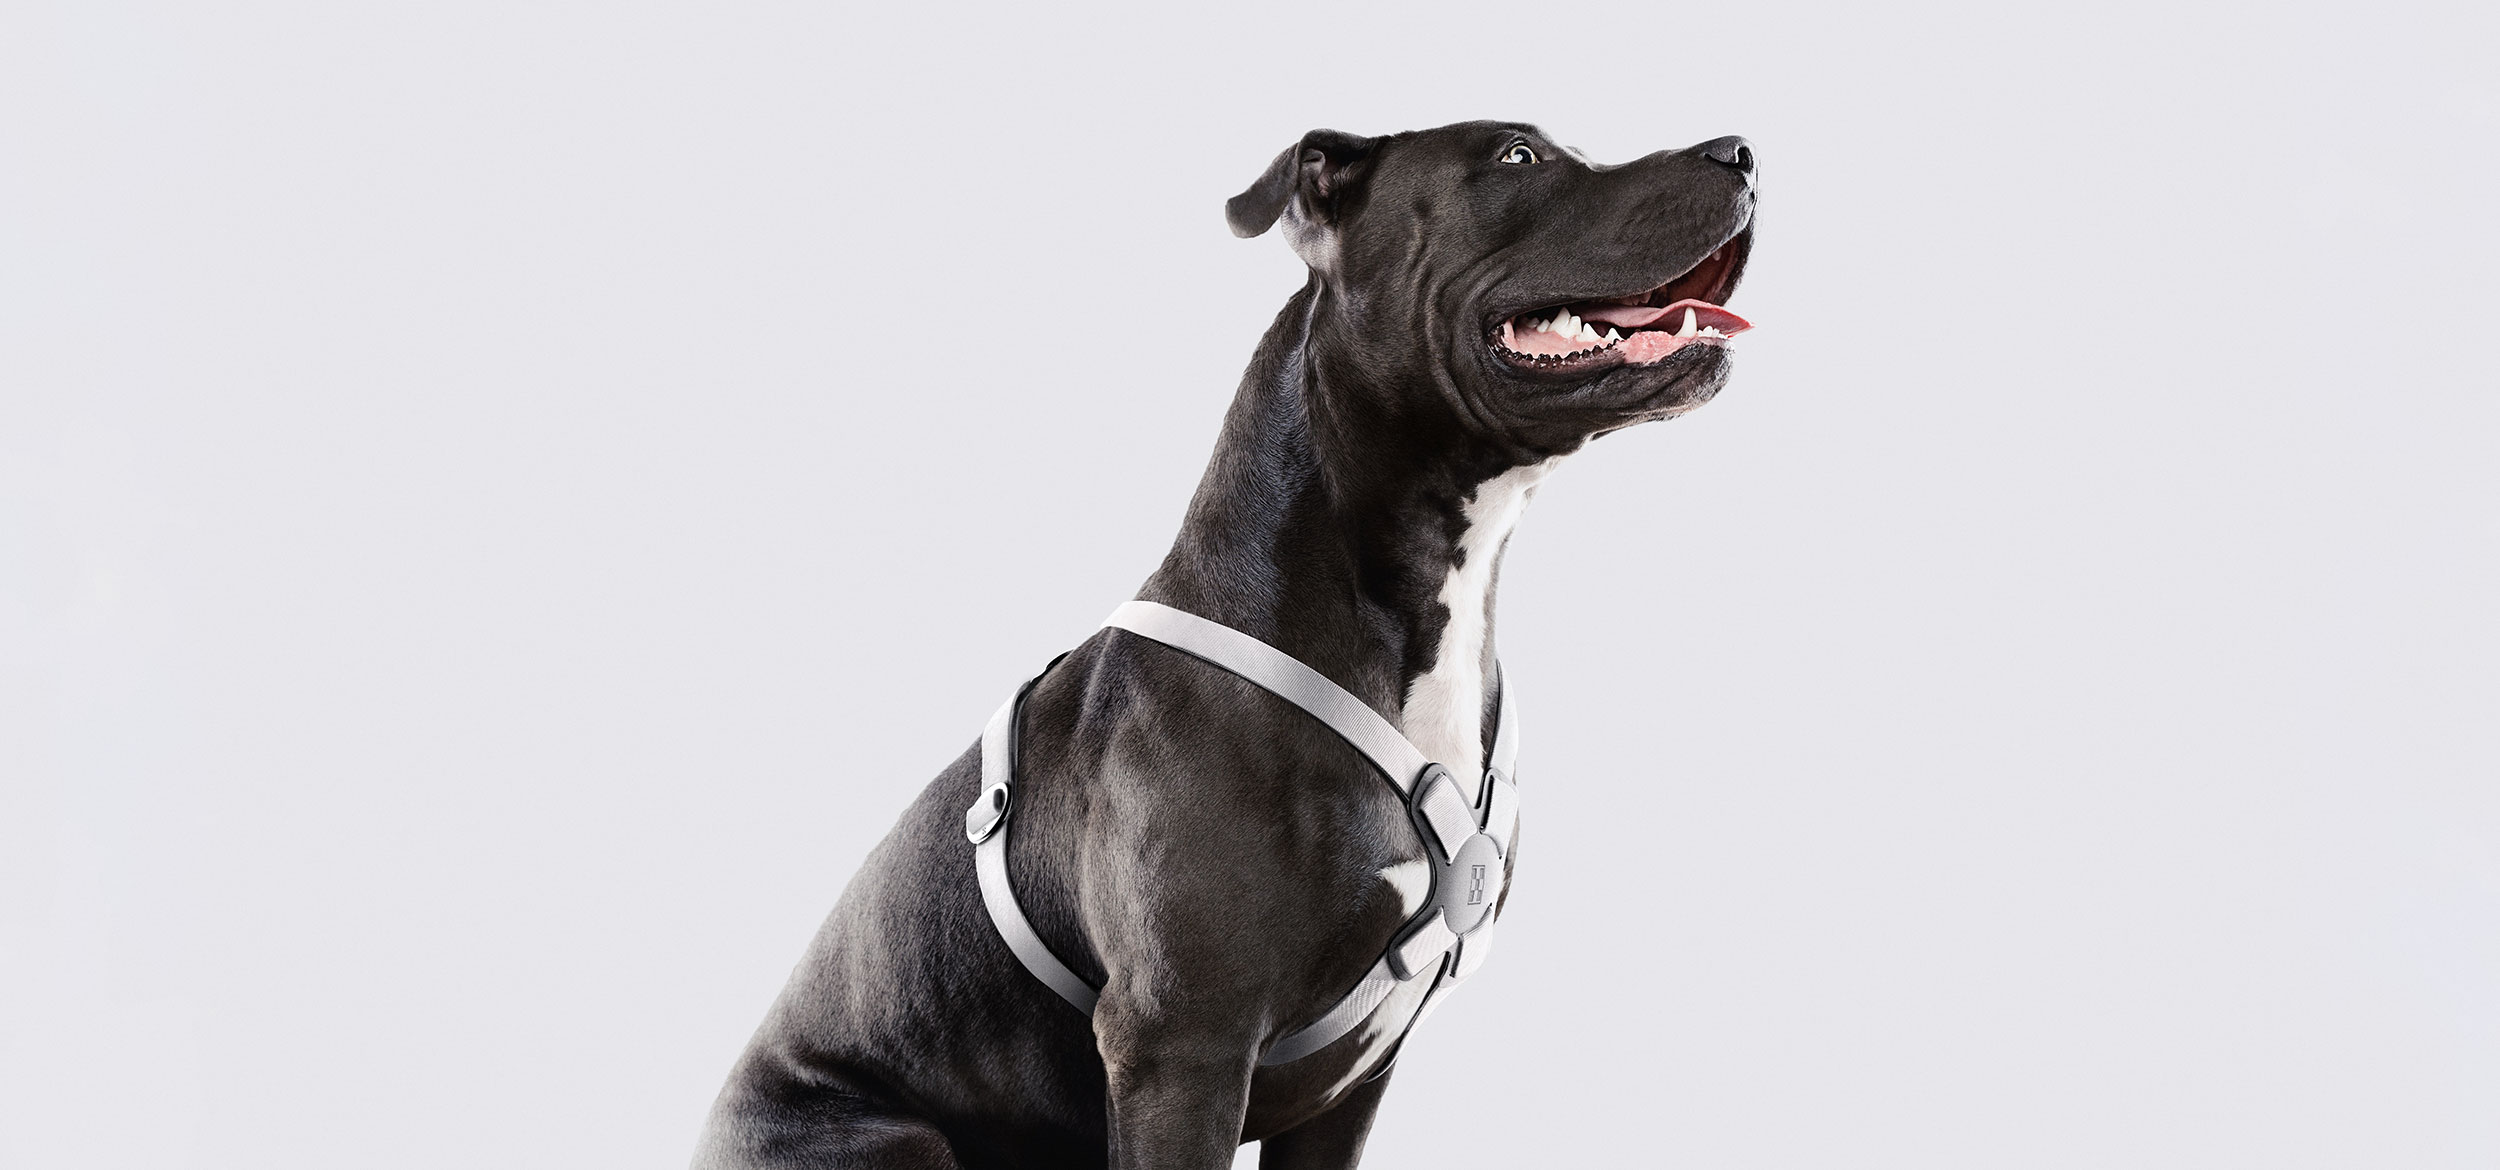 WHITE HARNESS ON DOG.jpg